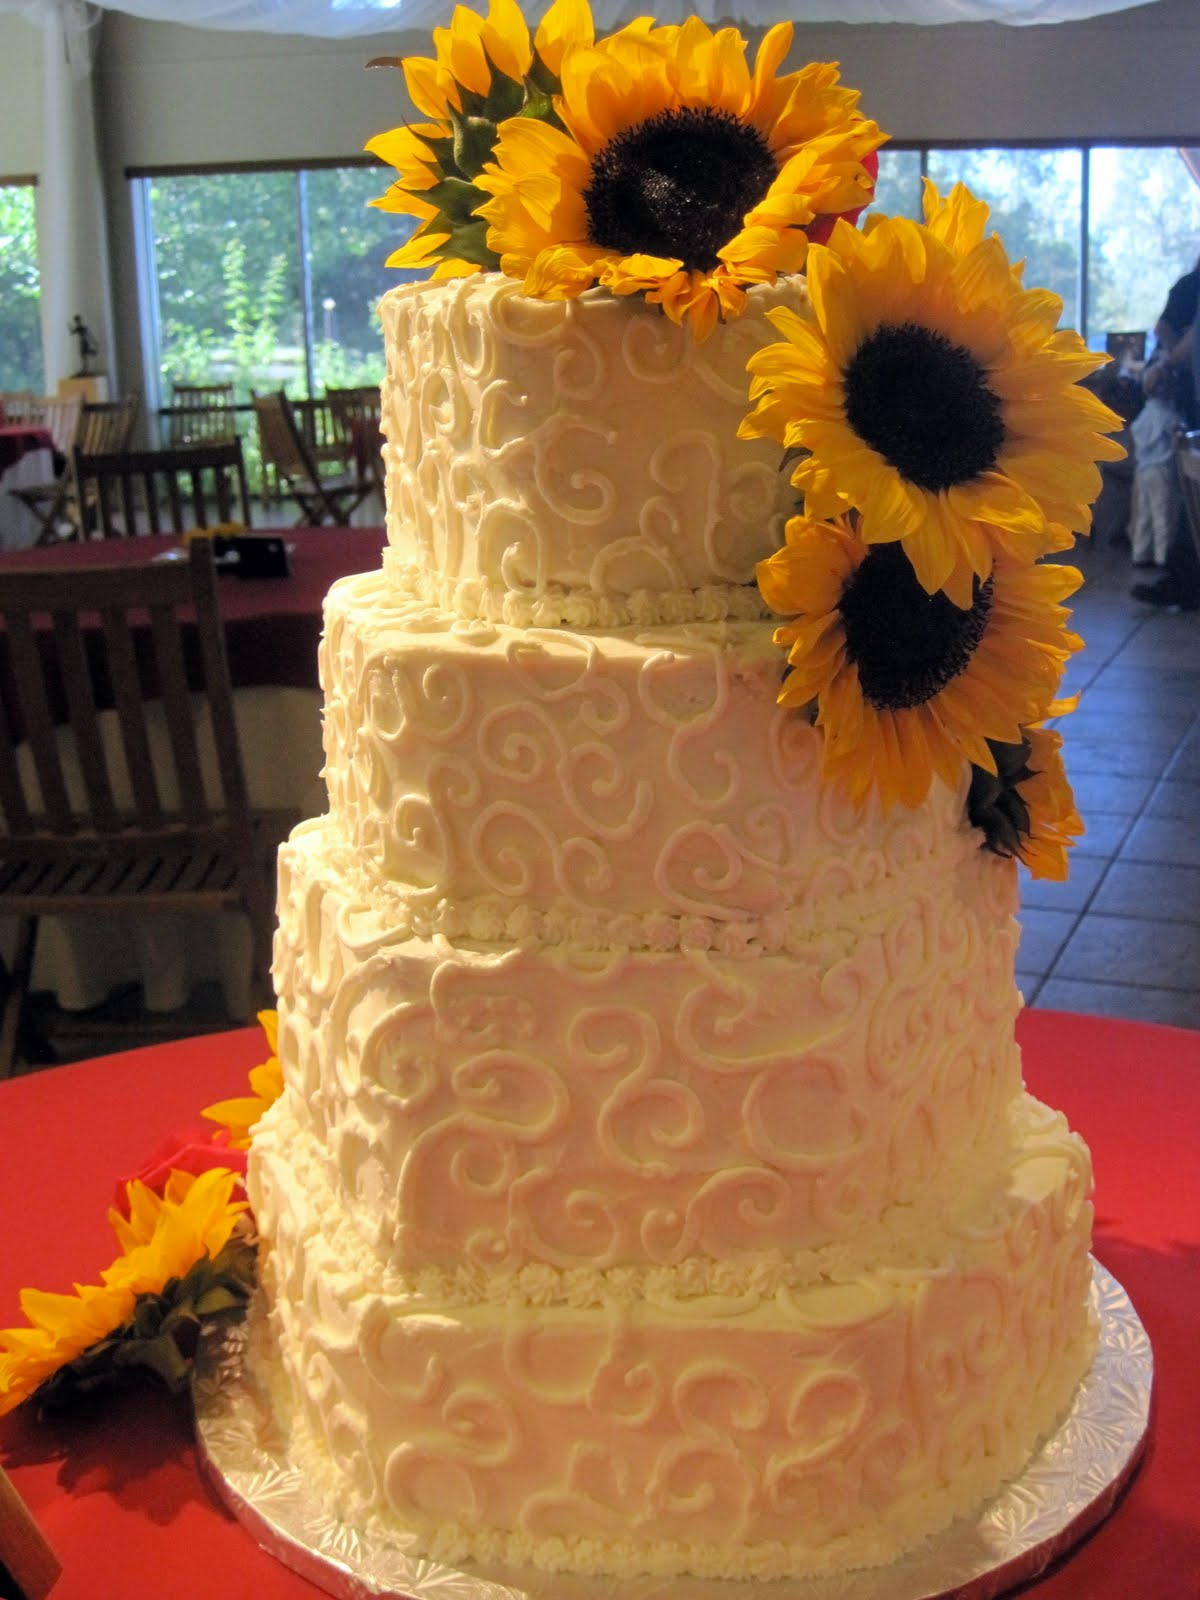 Sunflower Wedding Cake Cake Ideas and Designs